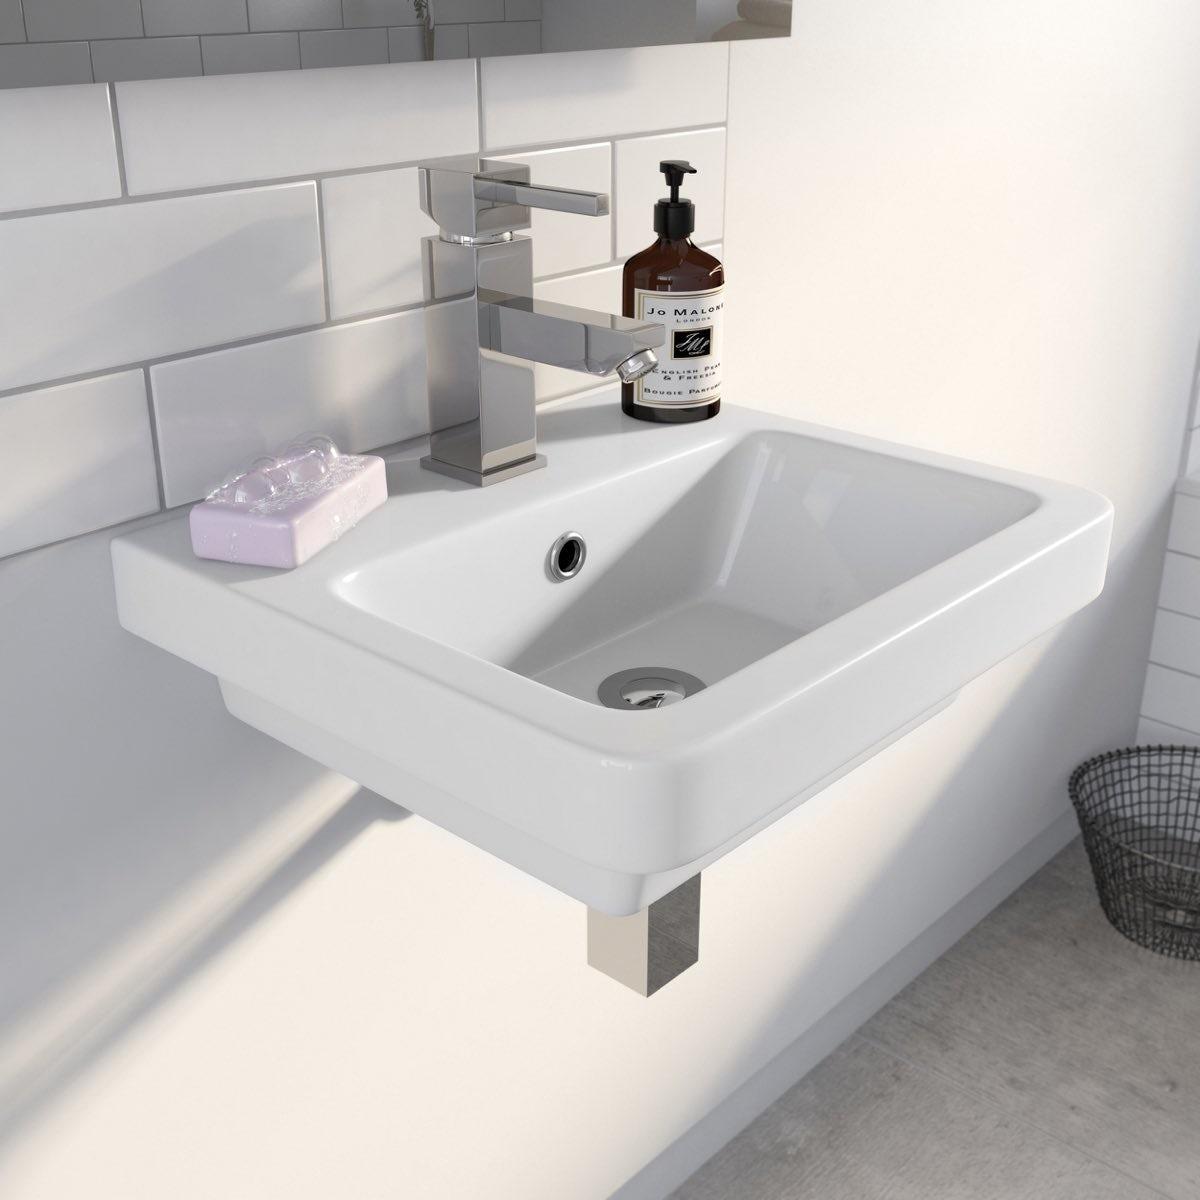 Bathroom Sinks Victoria Bc mode verso wall hung basin 400mm | victoriaplum